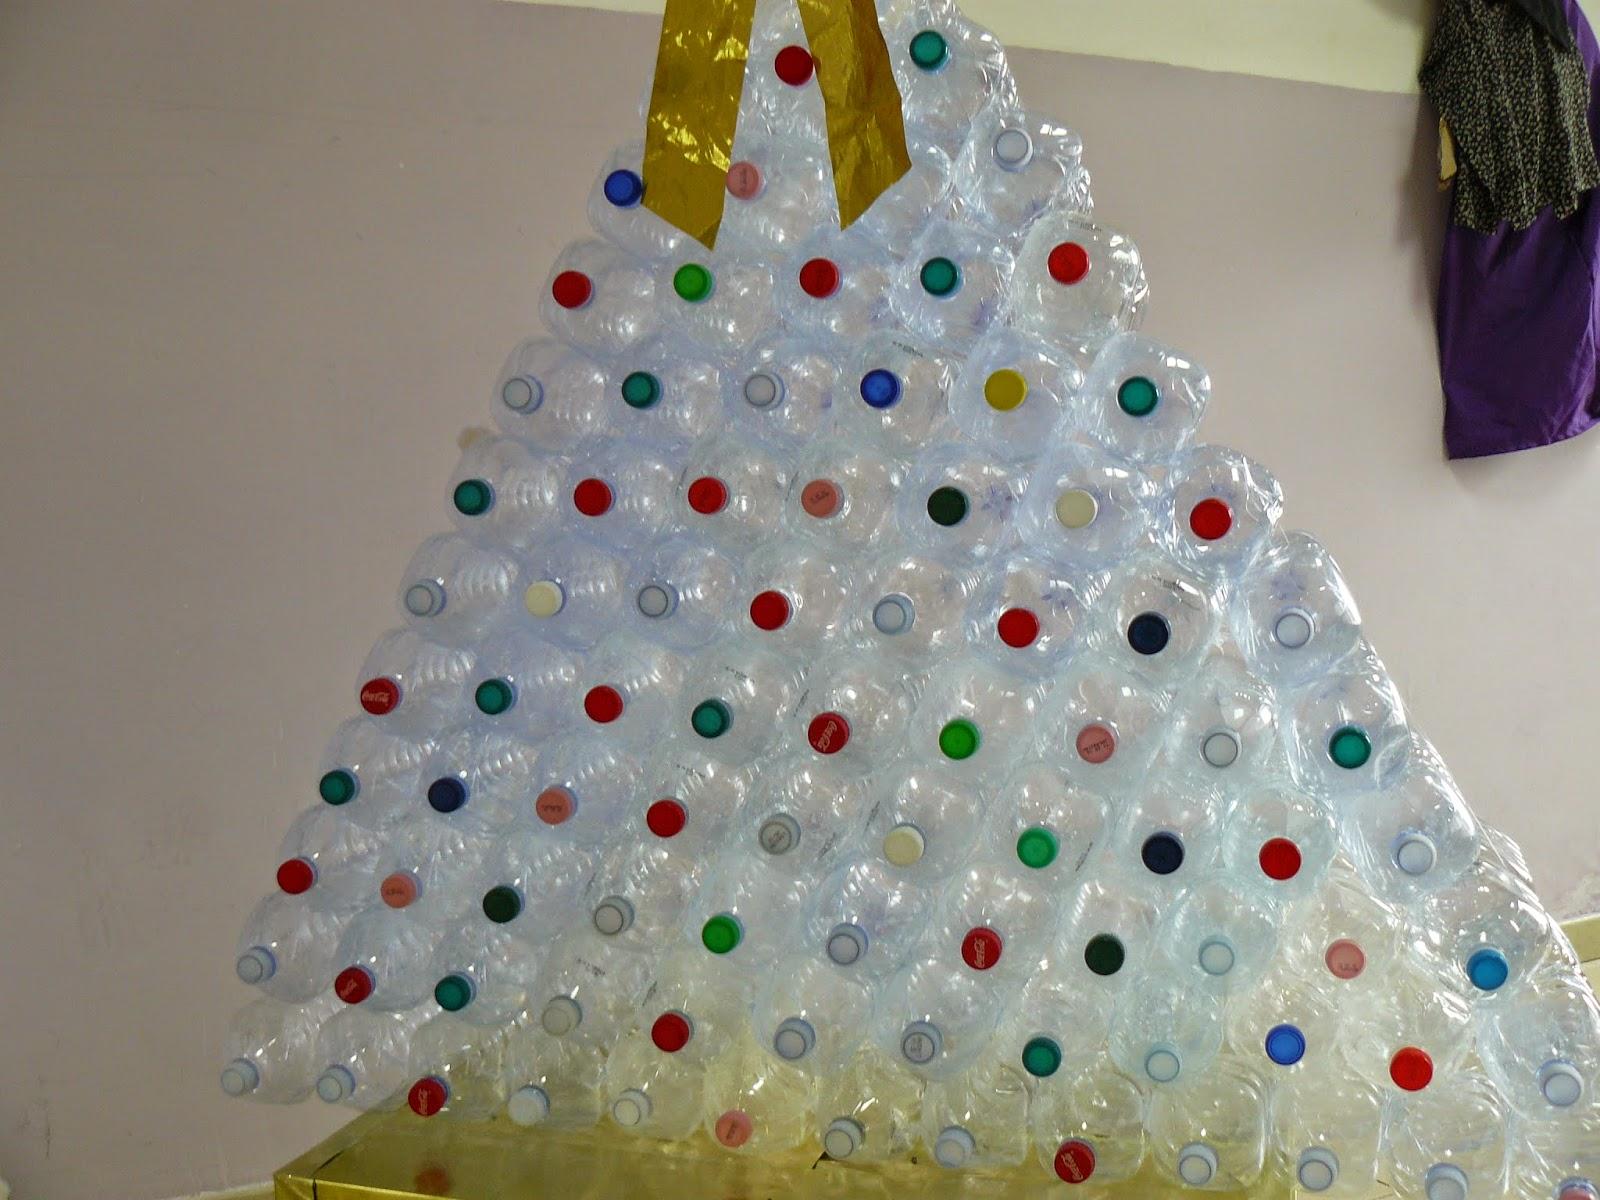 Laboratorio emozioni e creativit addobbi natalizi for Addobbi natalizi scuola